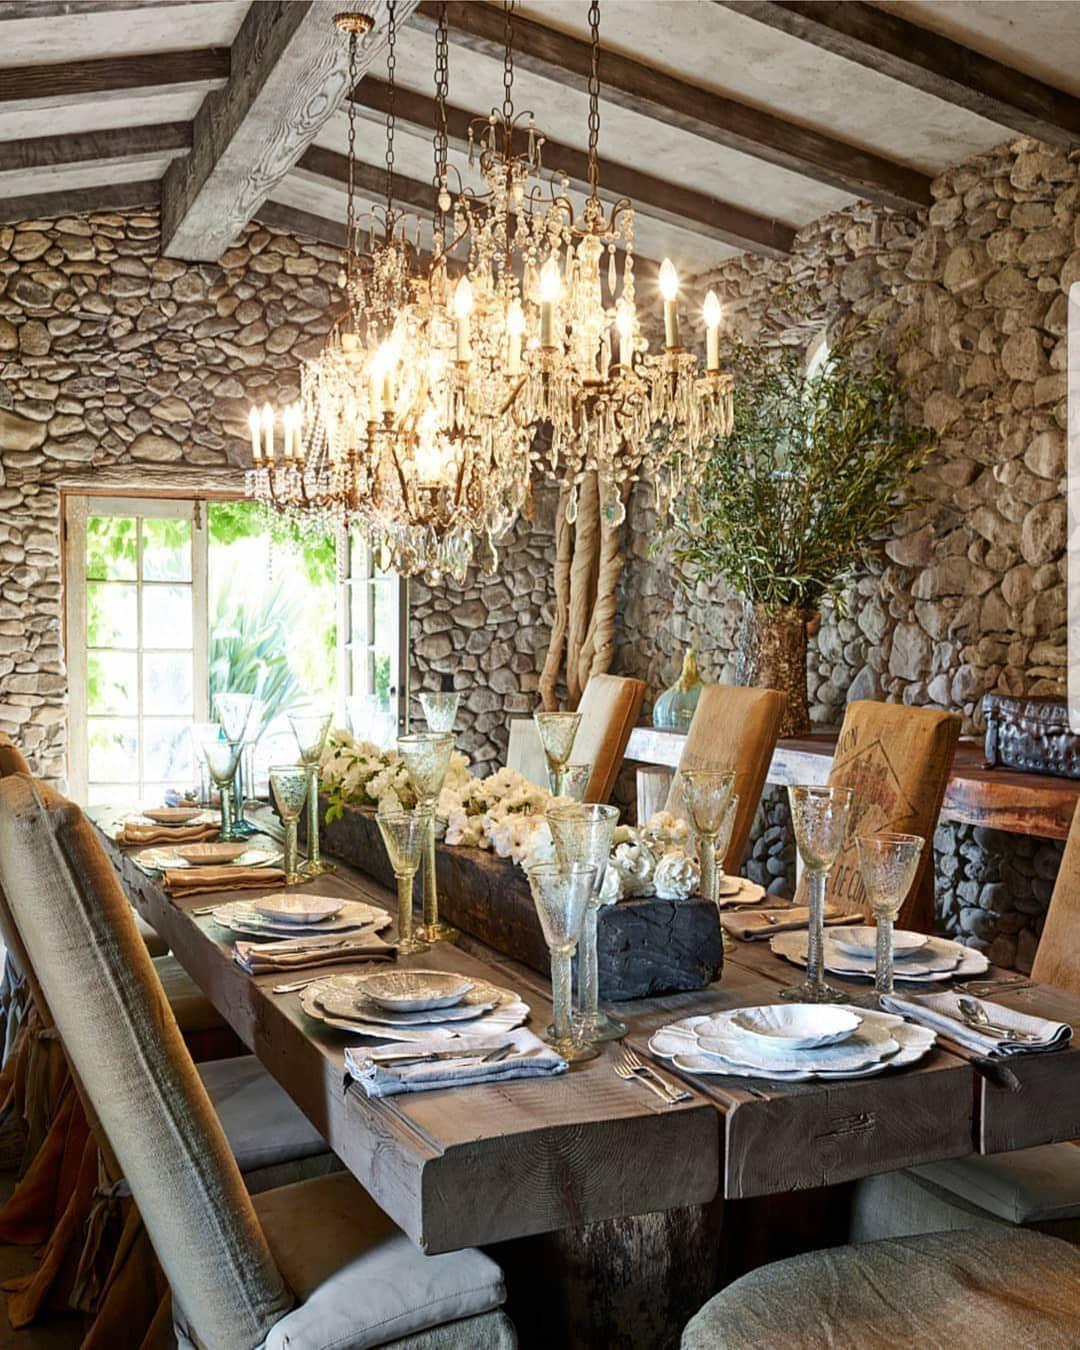 12 Rustic Dining Room Ideas: @thearmanihouse #byarmanihome #art #amazing #sun #travel